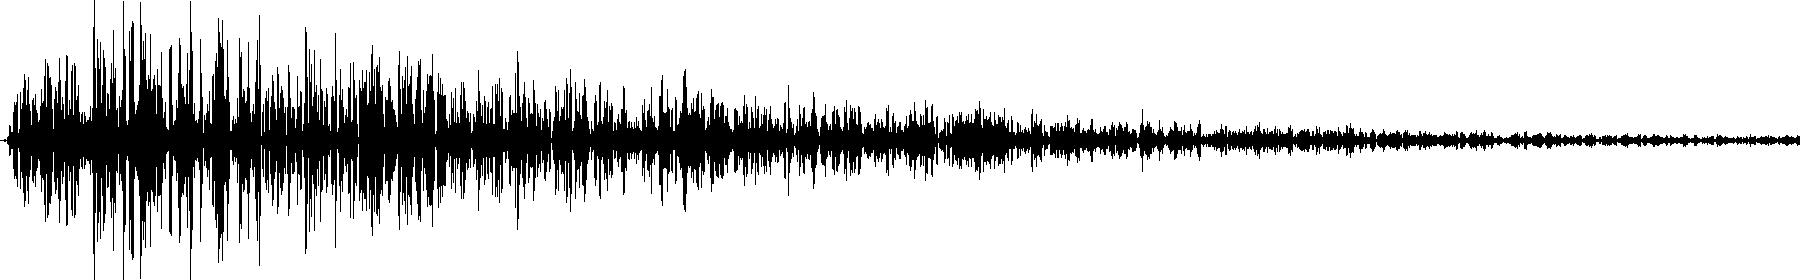 shg percussion 18